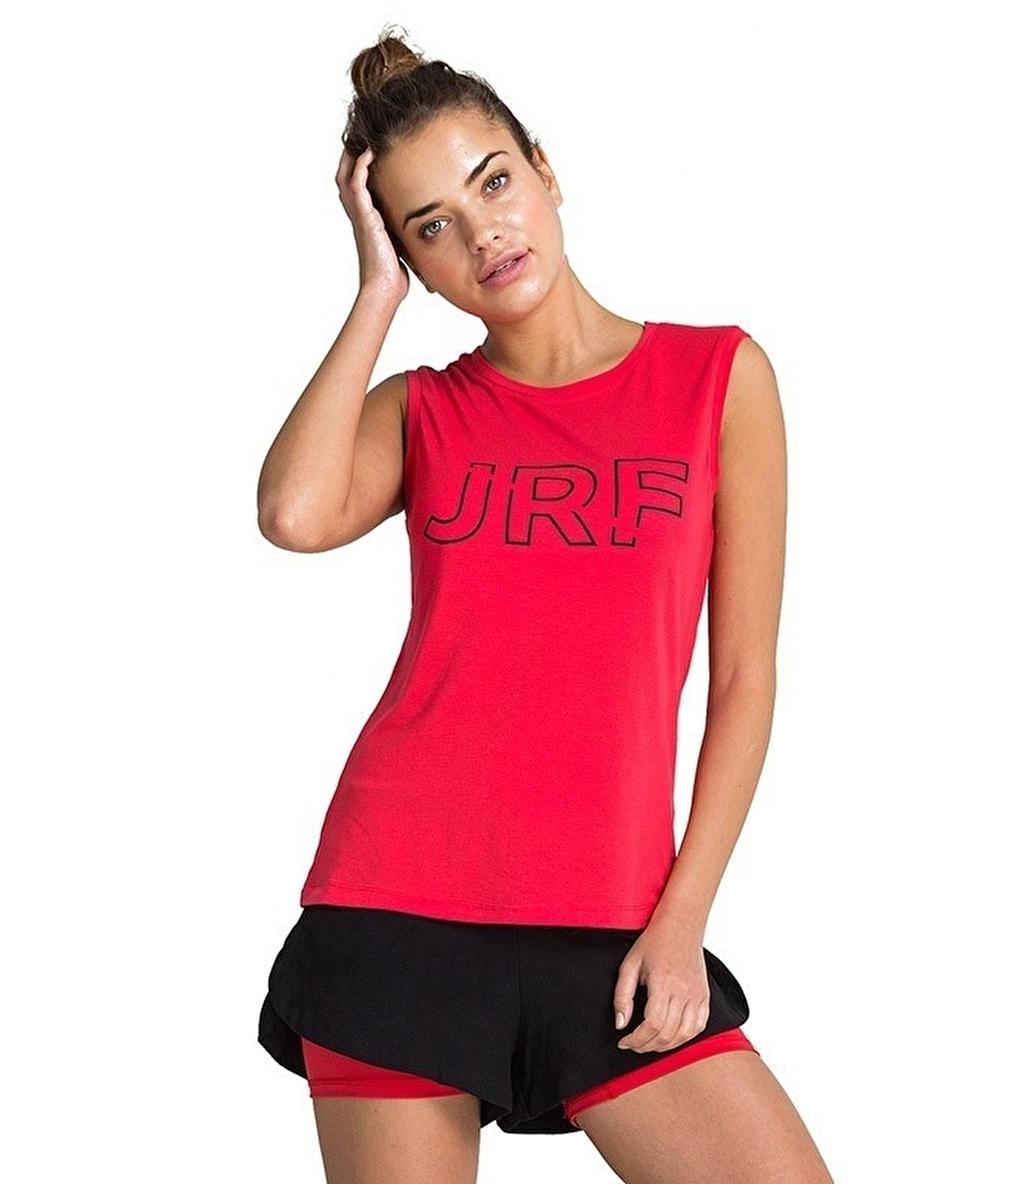 Jerf Cusco Atlet Kırmızı